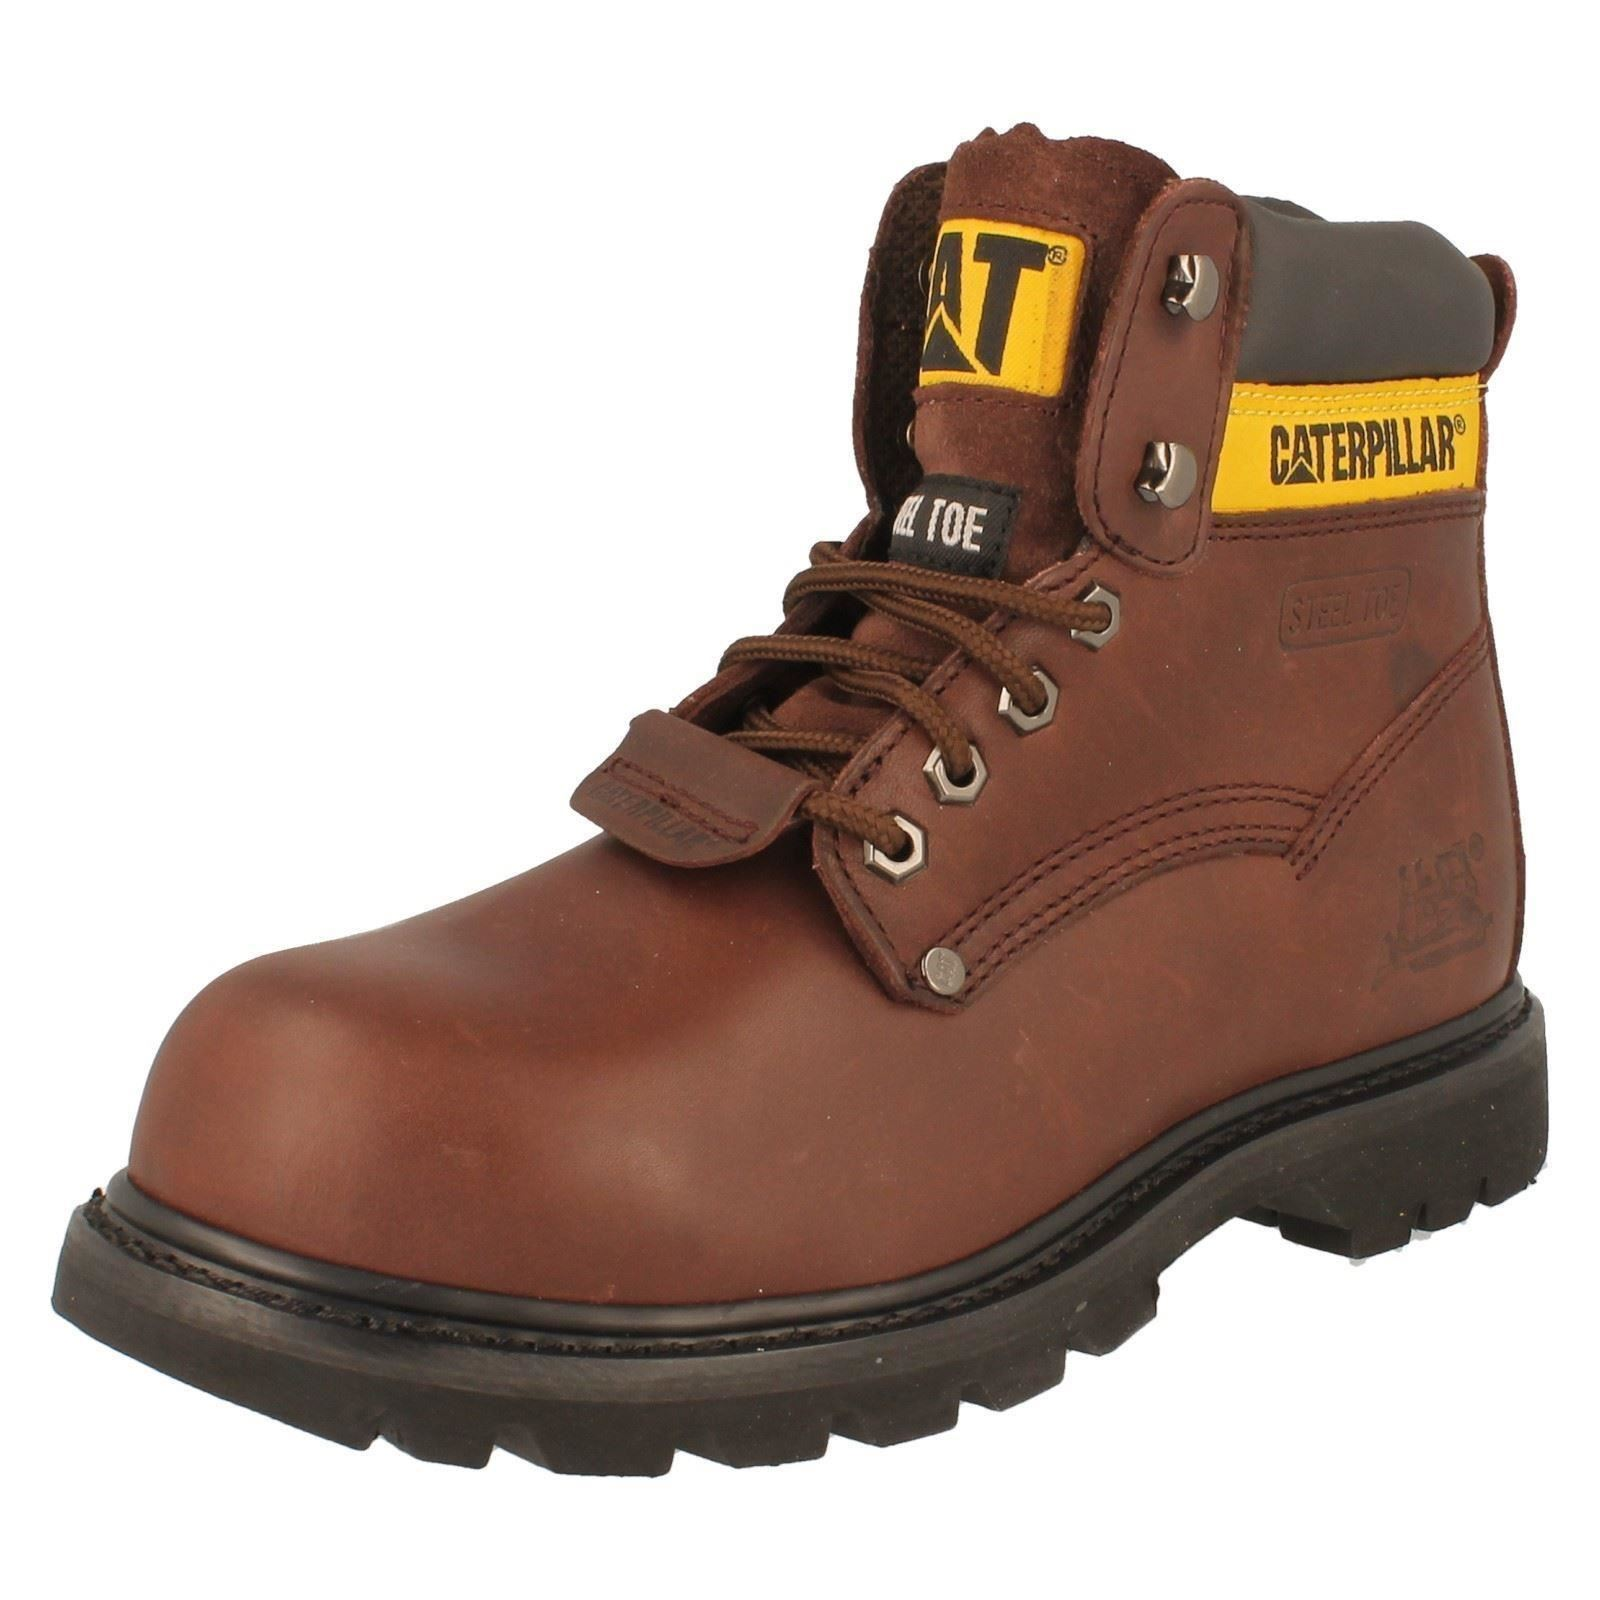 Mens Caterpillar Boots Steel Toe Safety Work Boots Caterpillar Style -  Sheffield 57c09e